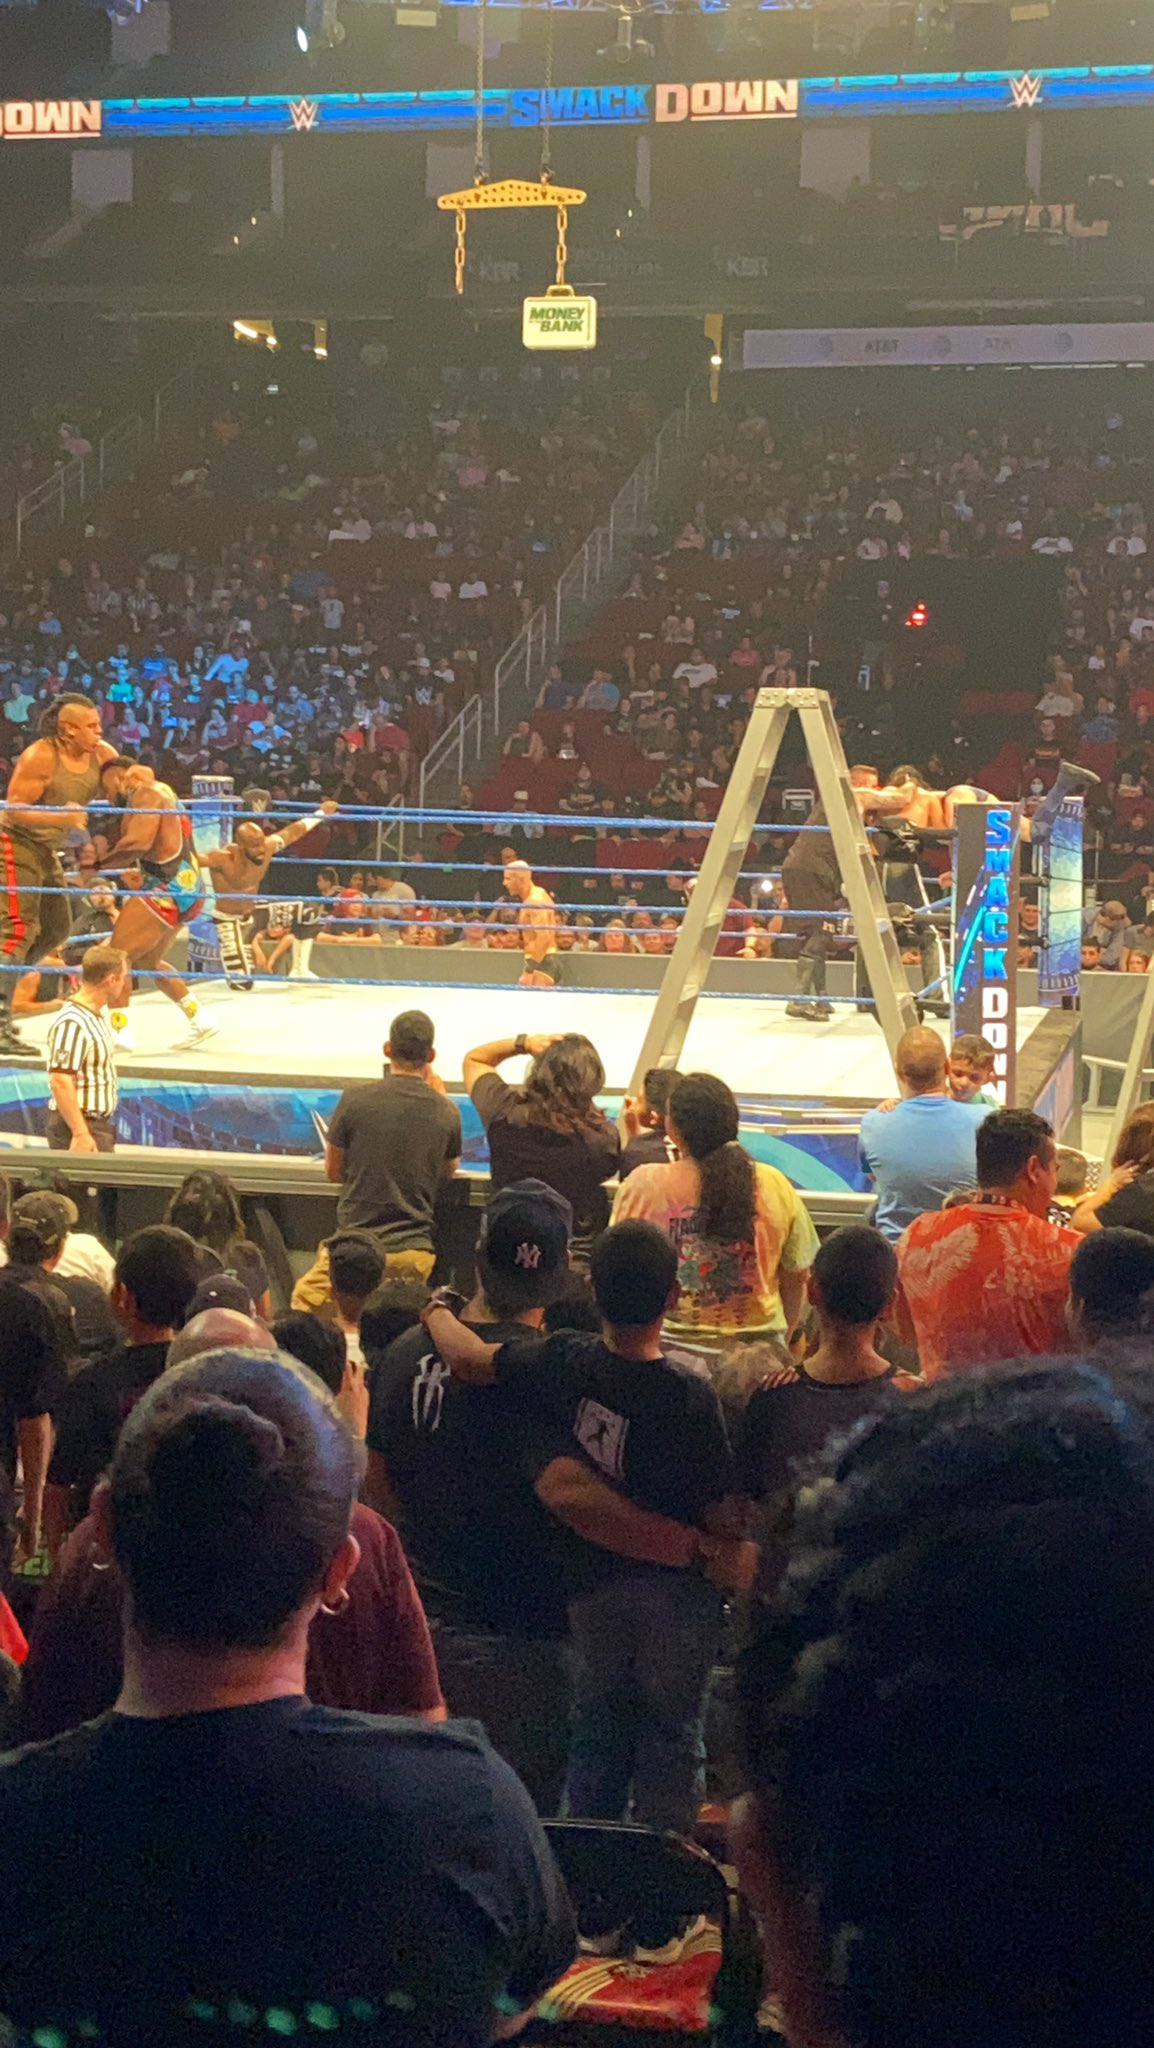 Smackdown July 16 Post-Show: Roman Reigns Shows Middle-Finger; Battle Royal 35